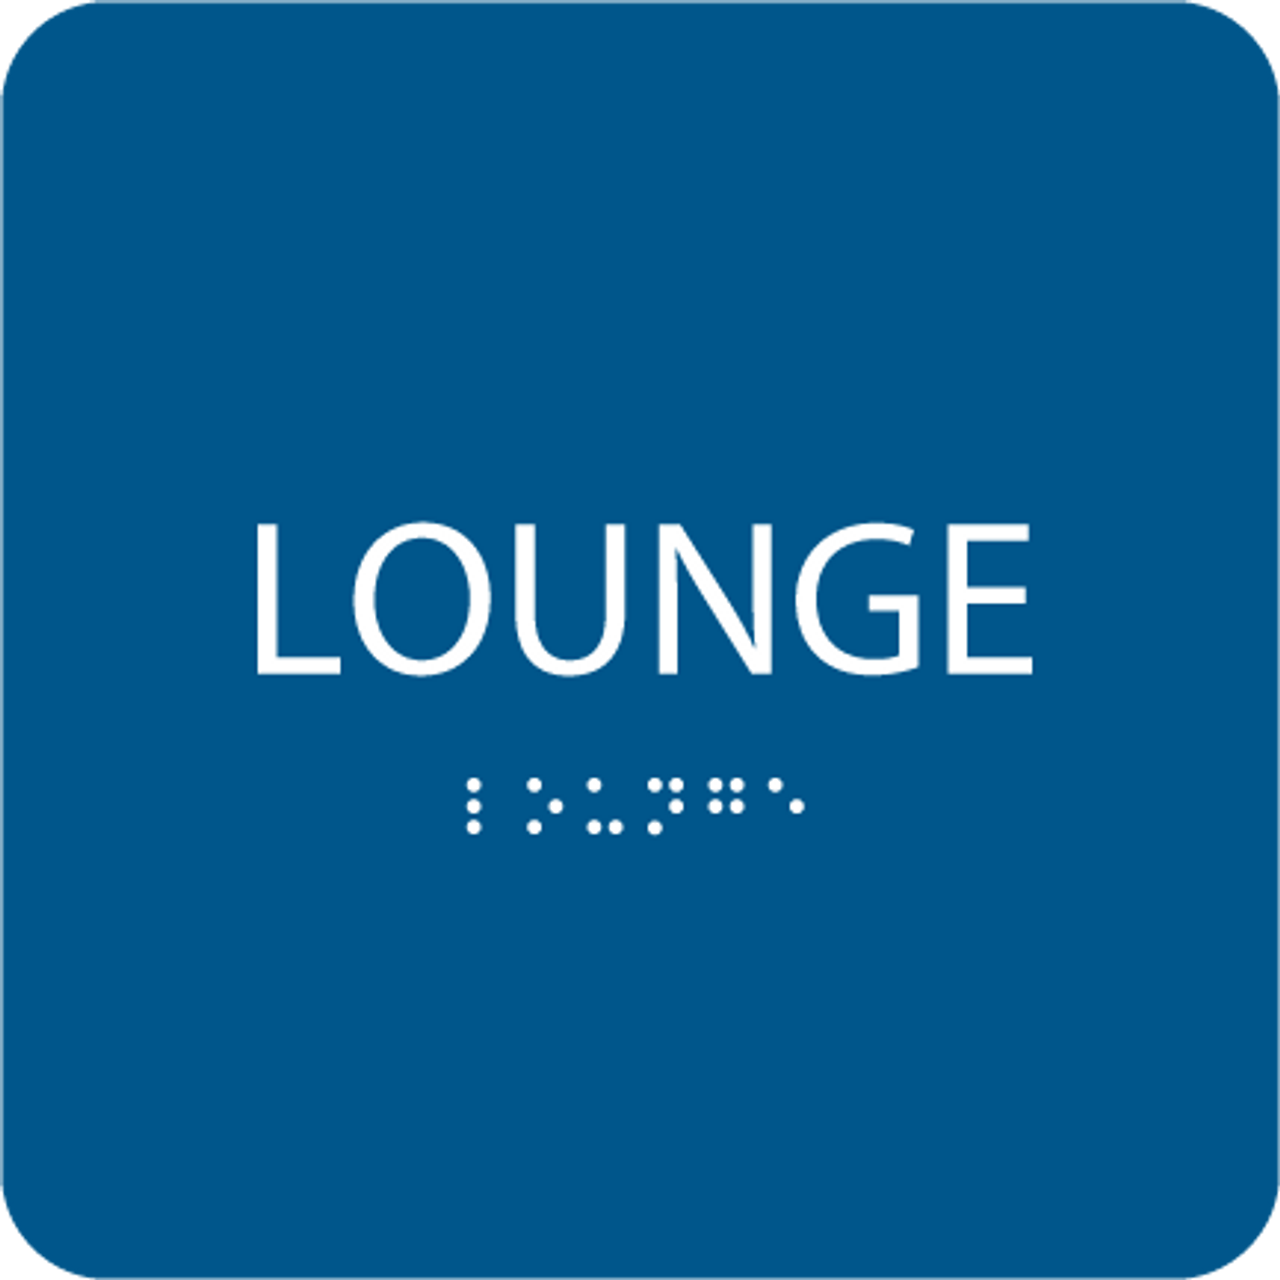 Blue Lounge ADA Sign